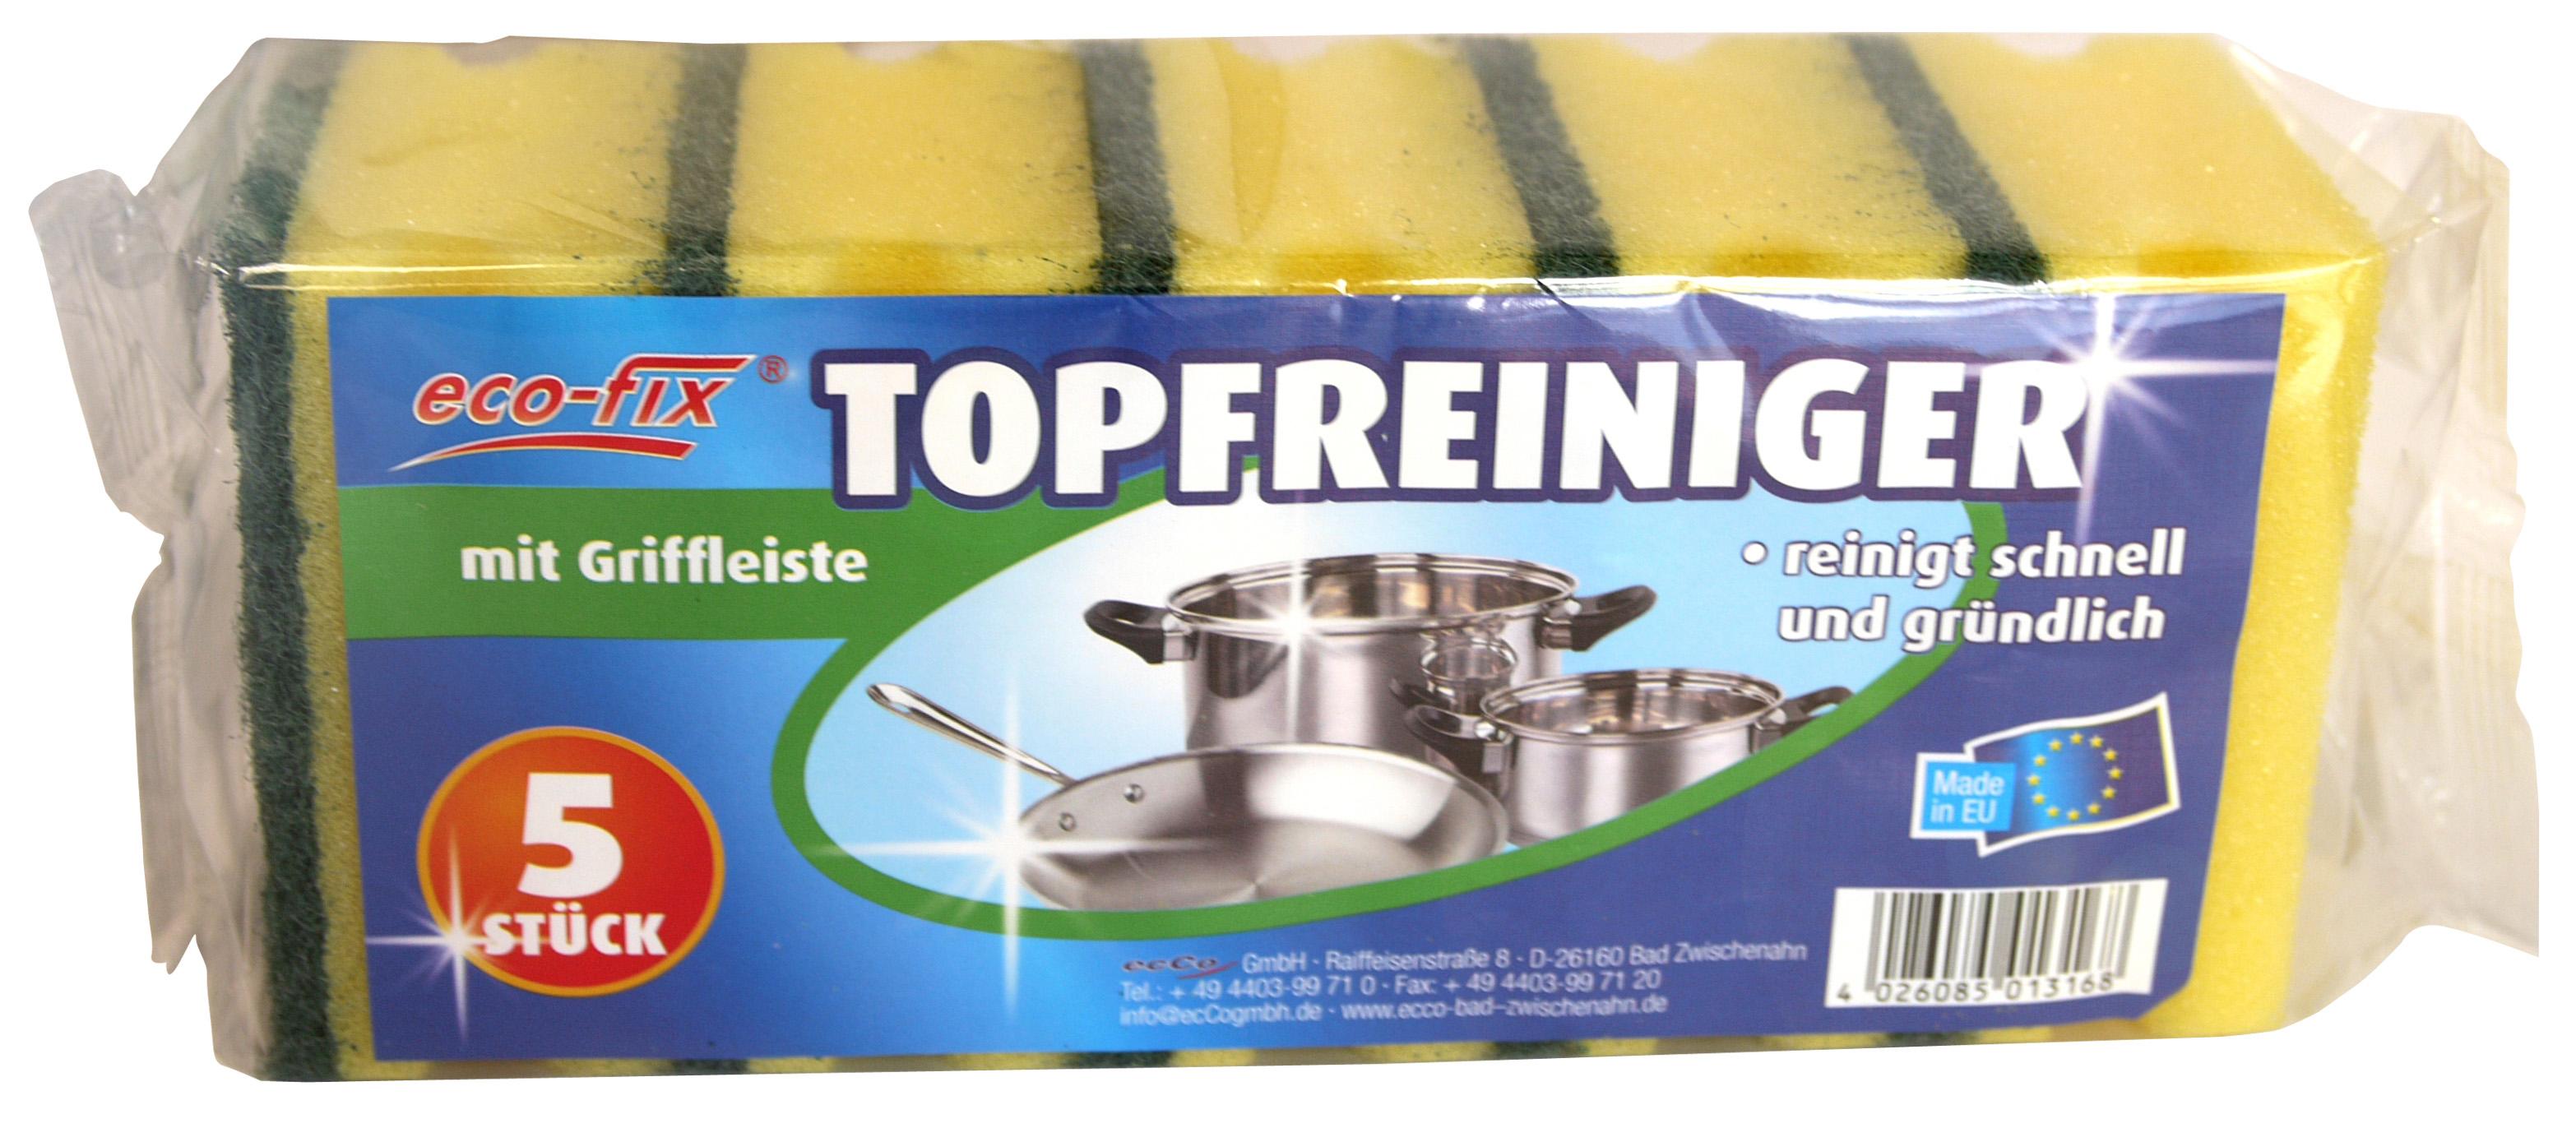 01316 - eco-fix Topfreiniger 5er mit Griffleiste